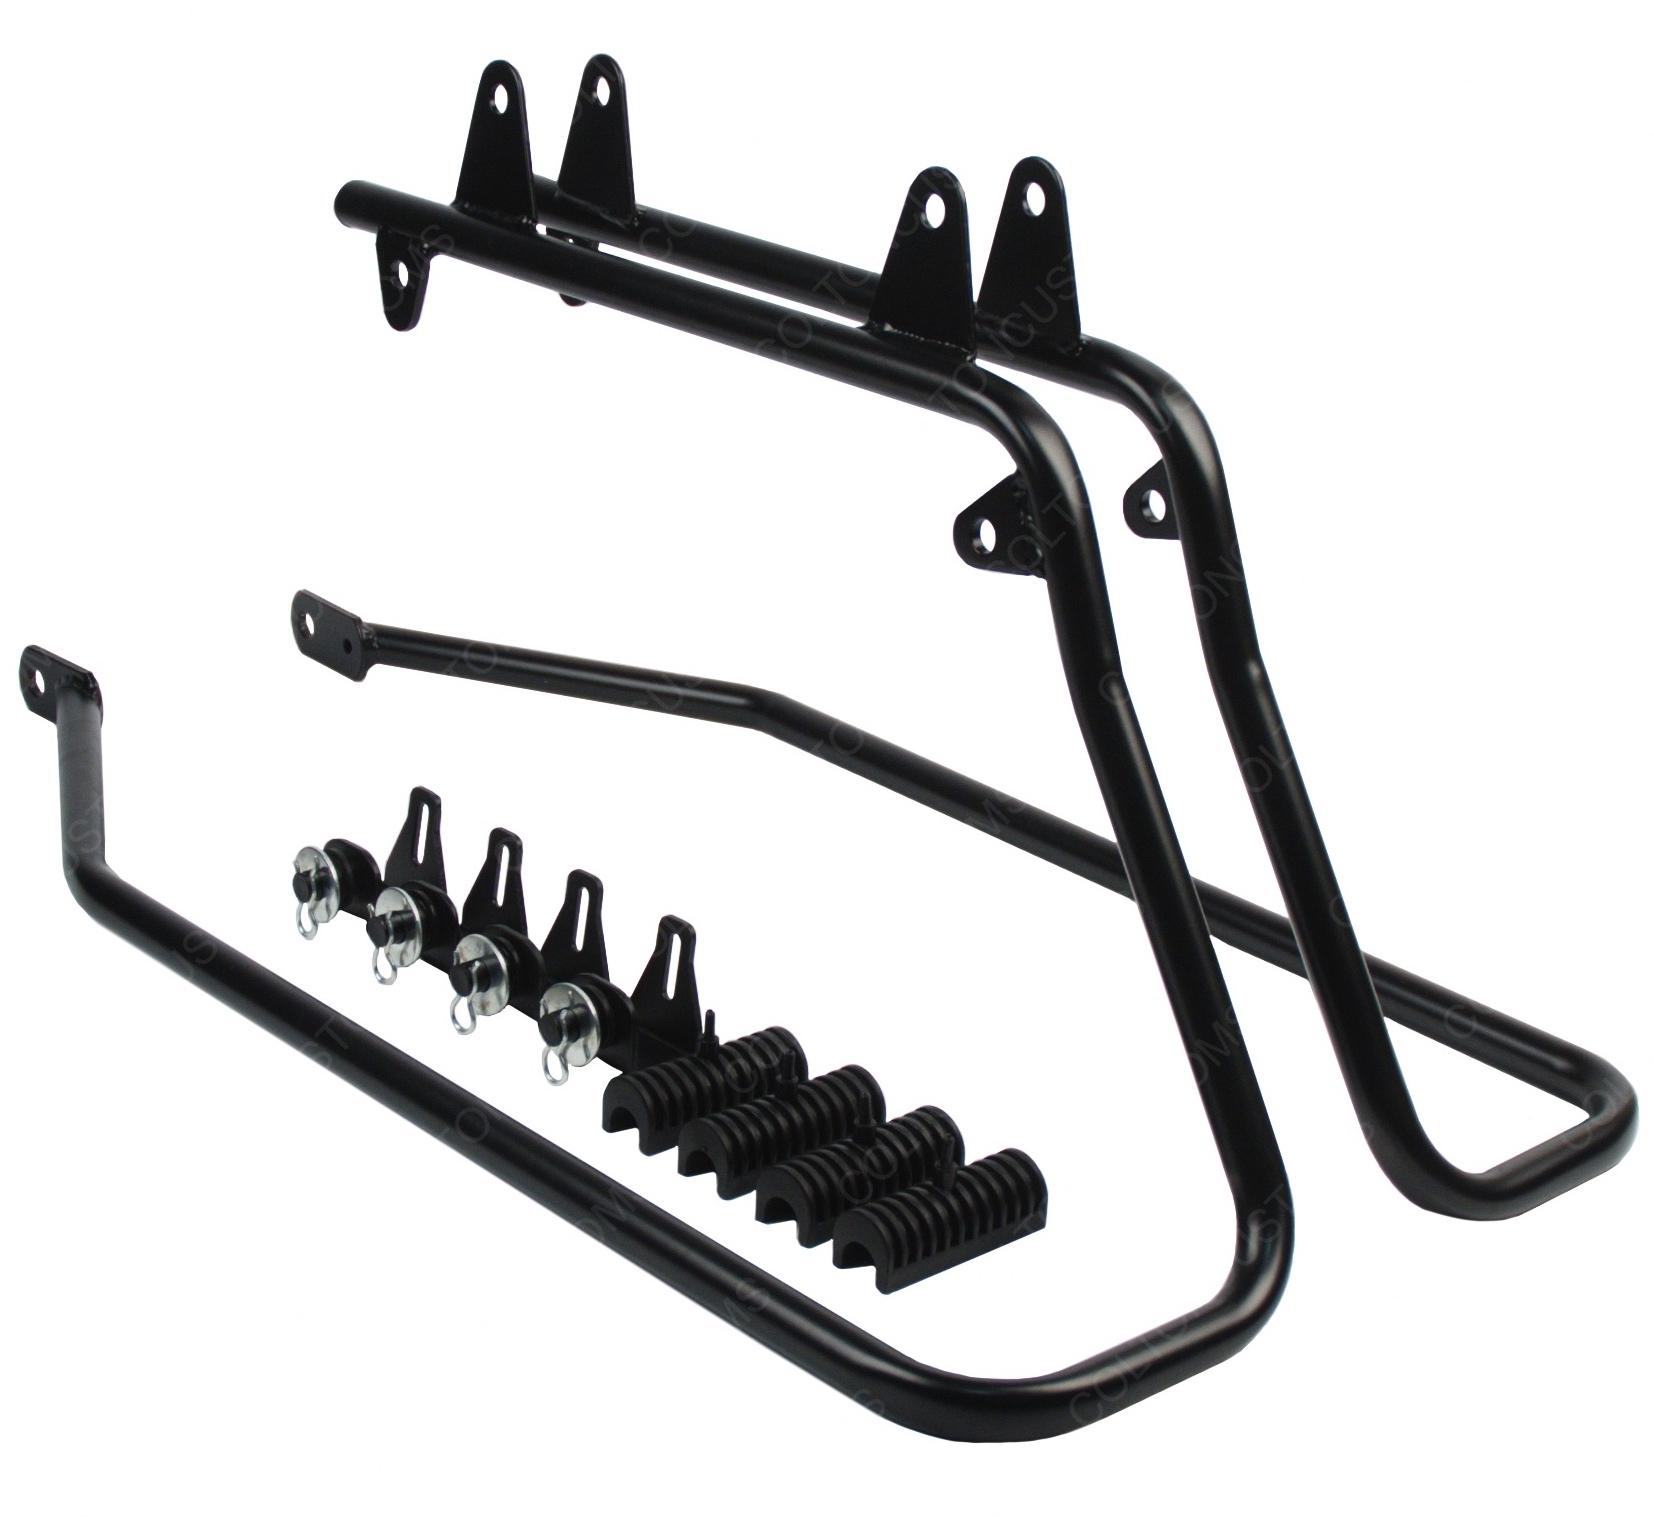 Heavy Duty Softail Bagger Conversion Kit Brackets For Harley Davidson Ebay